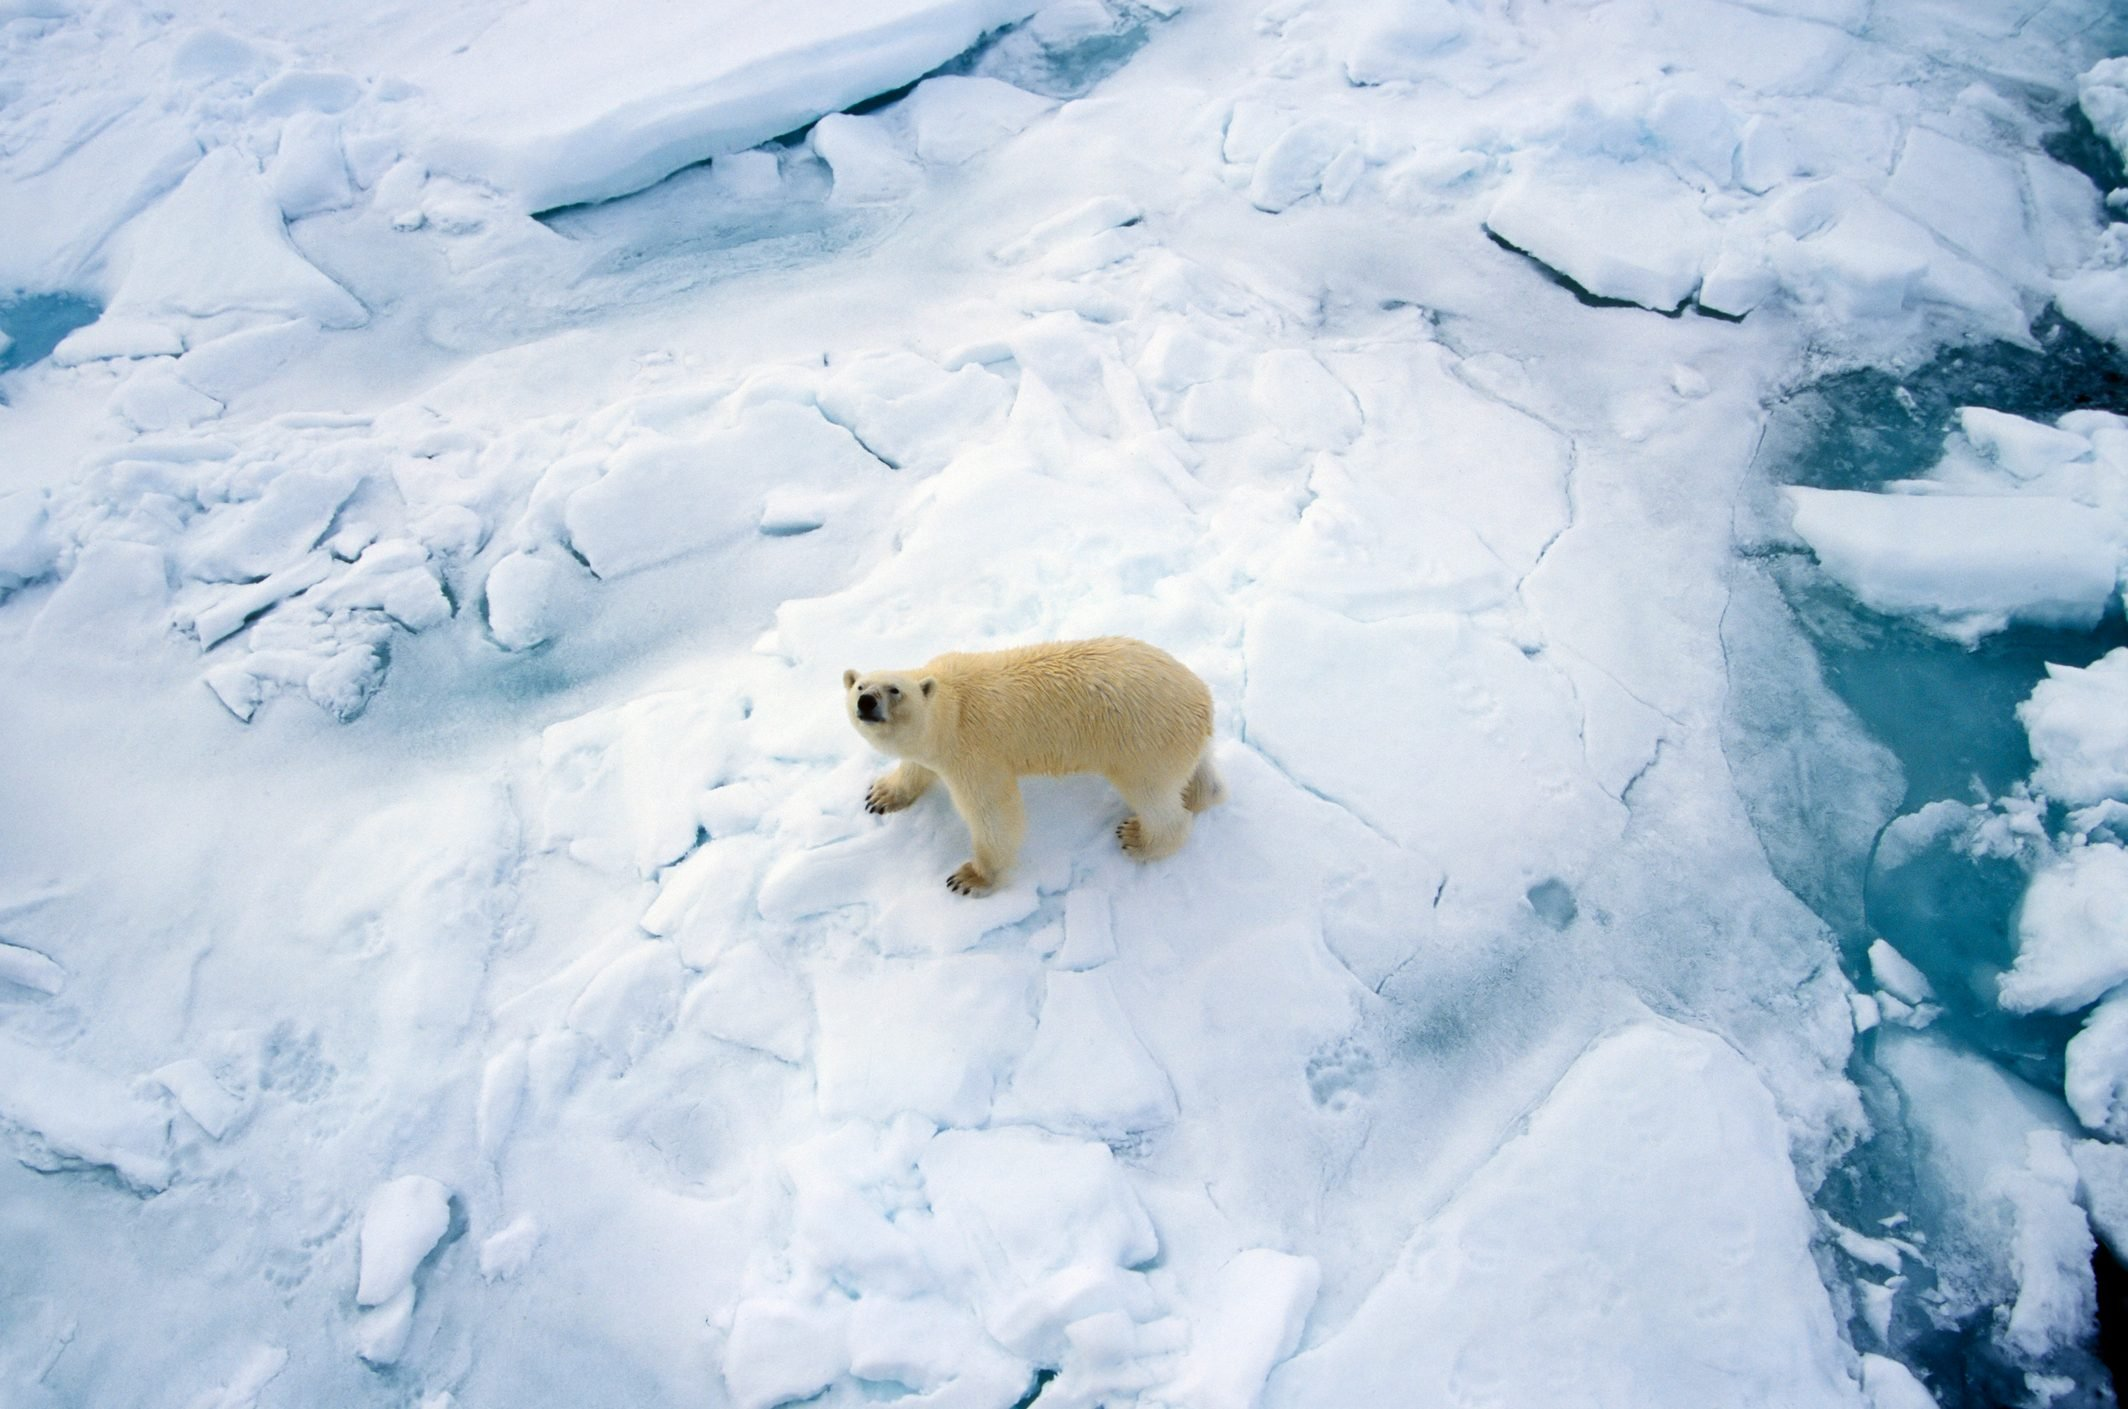 Polar Bear (Ursus maritimus) on Sea ice, Svalbard, Arctic Ocean